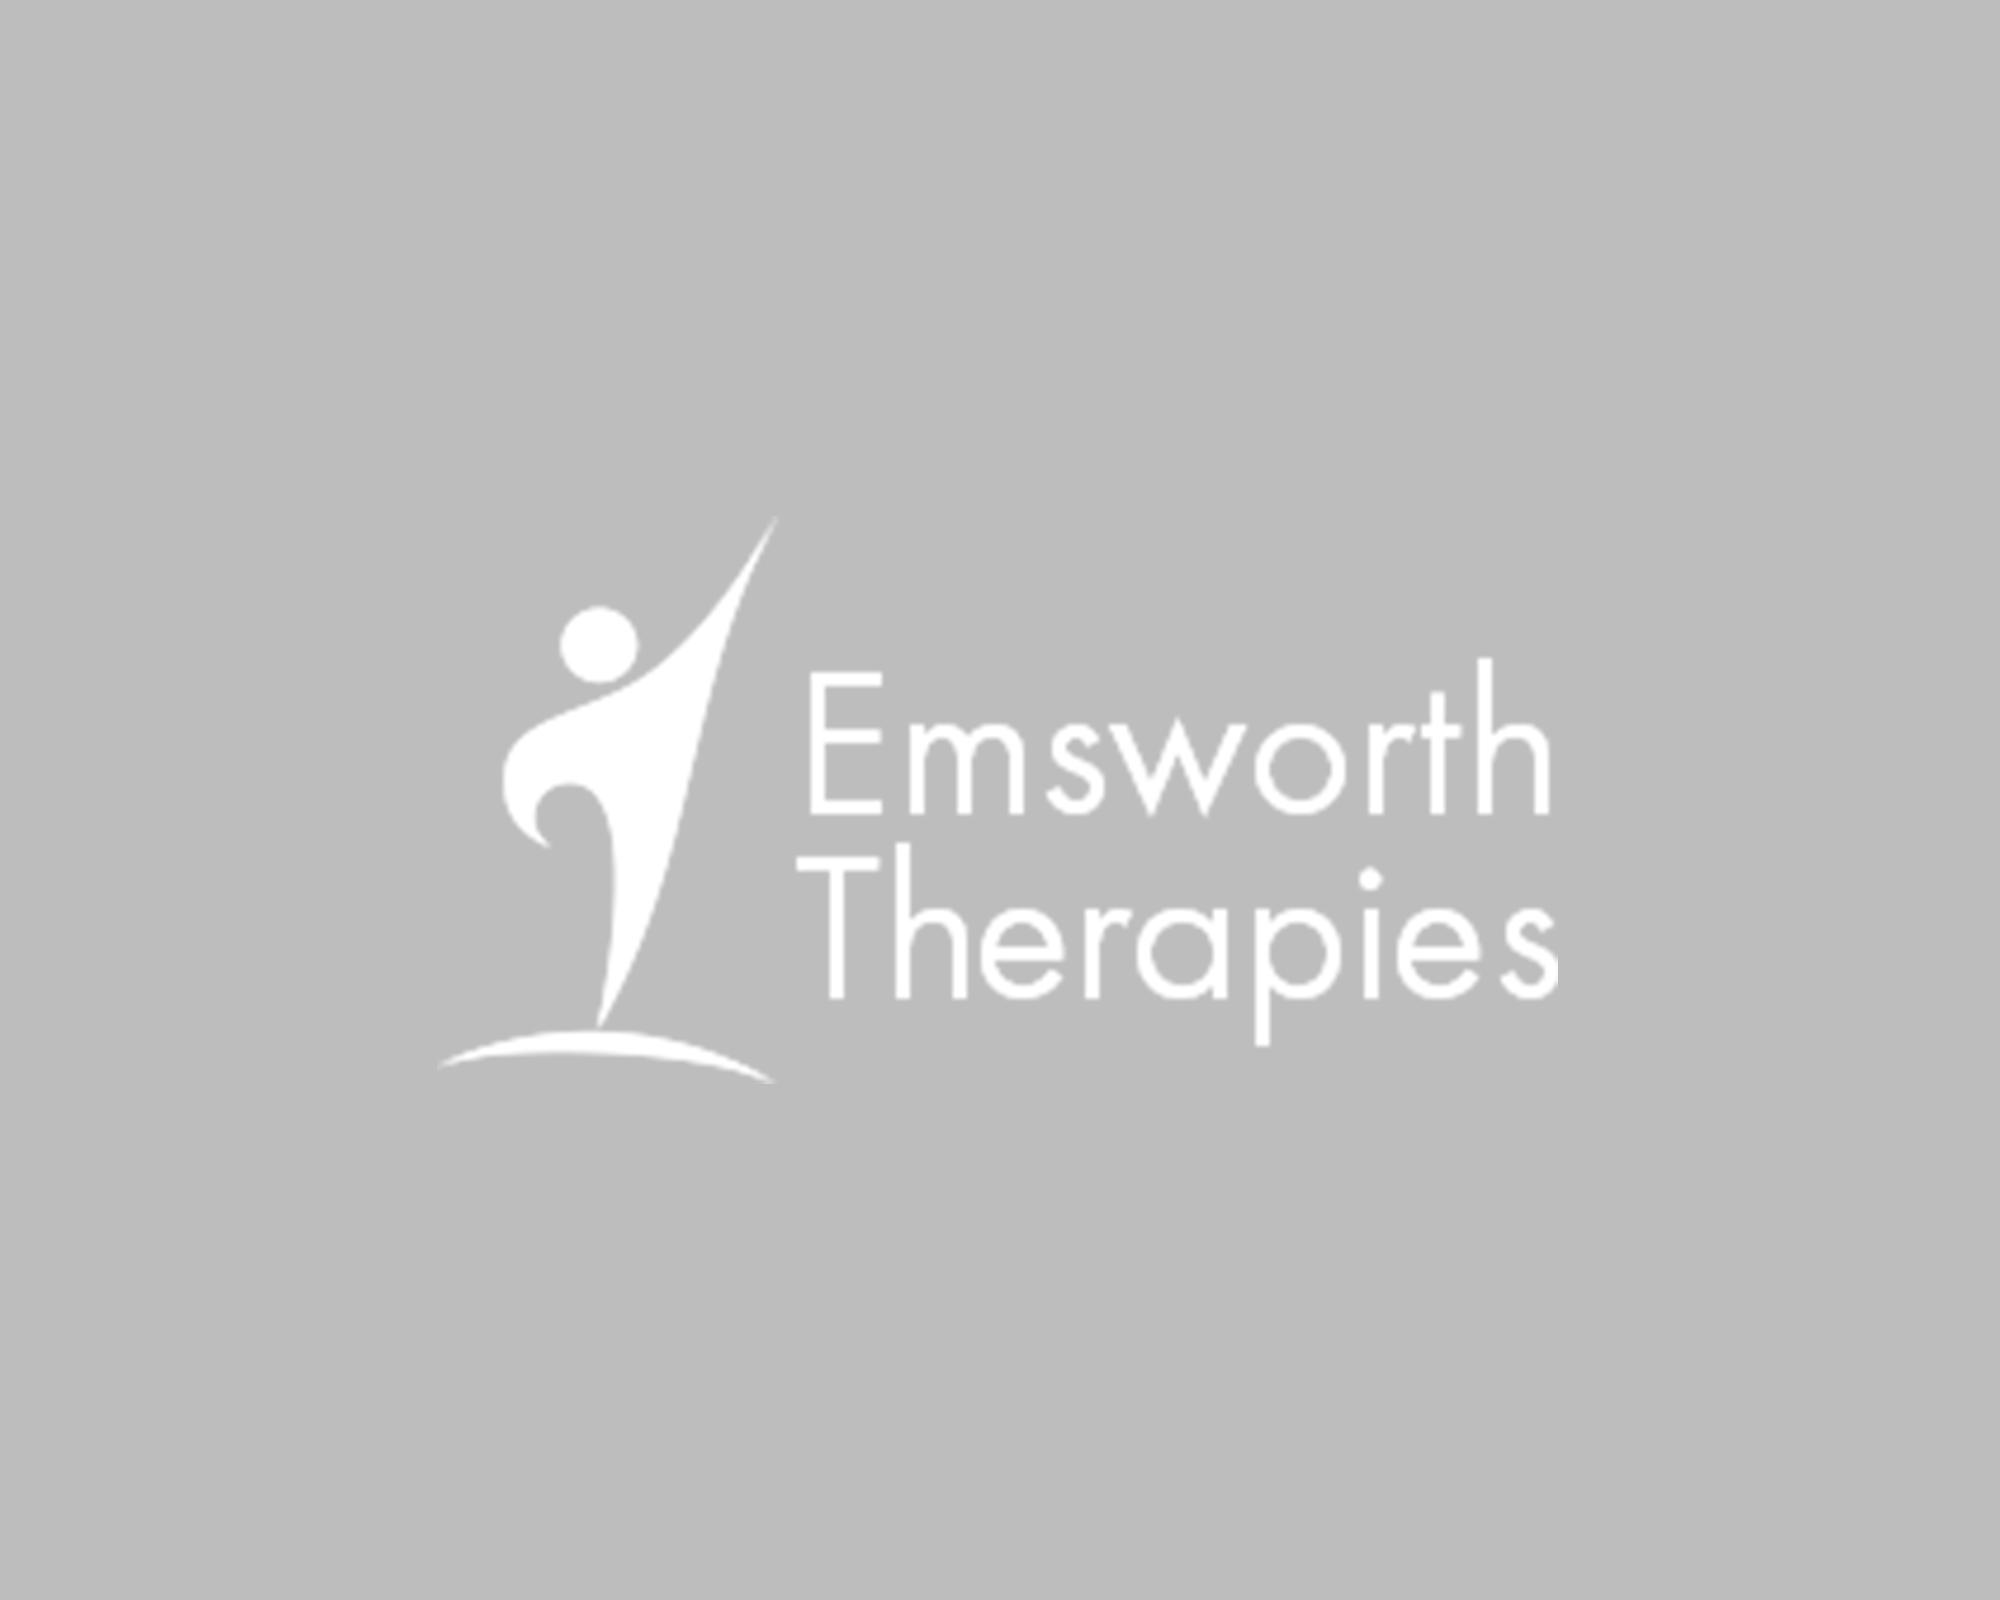 emsworth therapies Logo